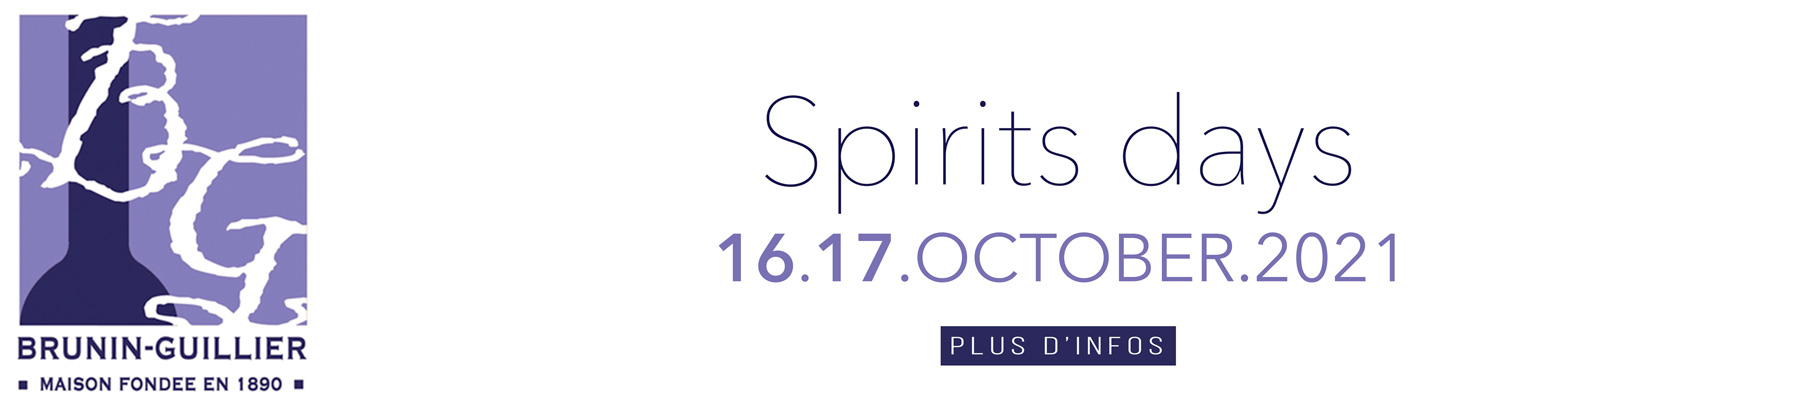 Spirits Days